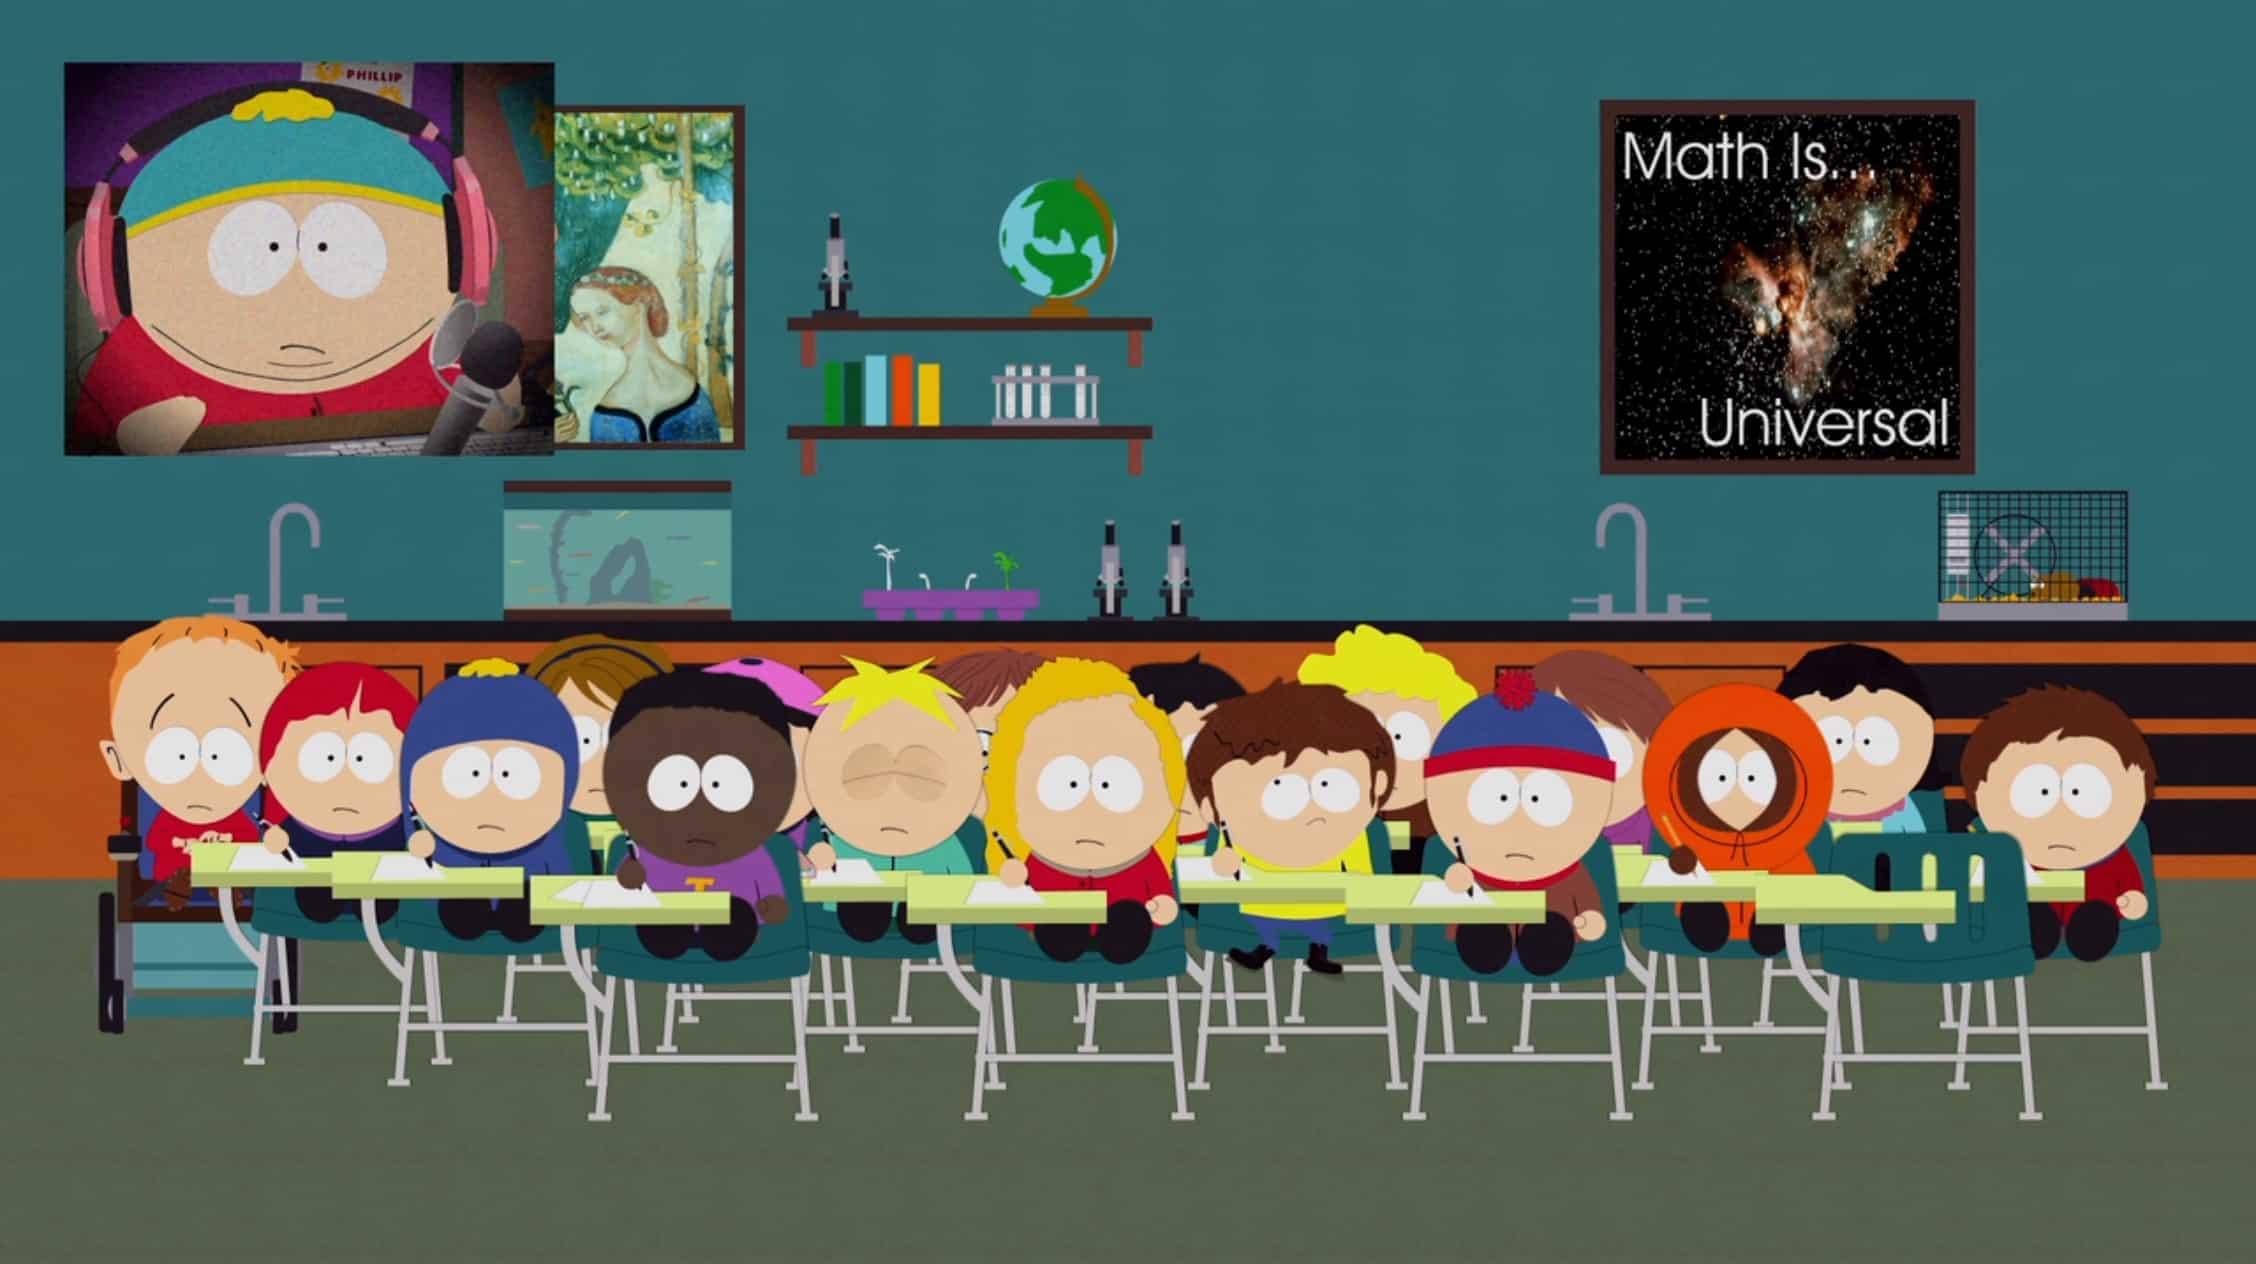 Cartman's stream disrupts Kyle's speech in Mr. Garrison's class.